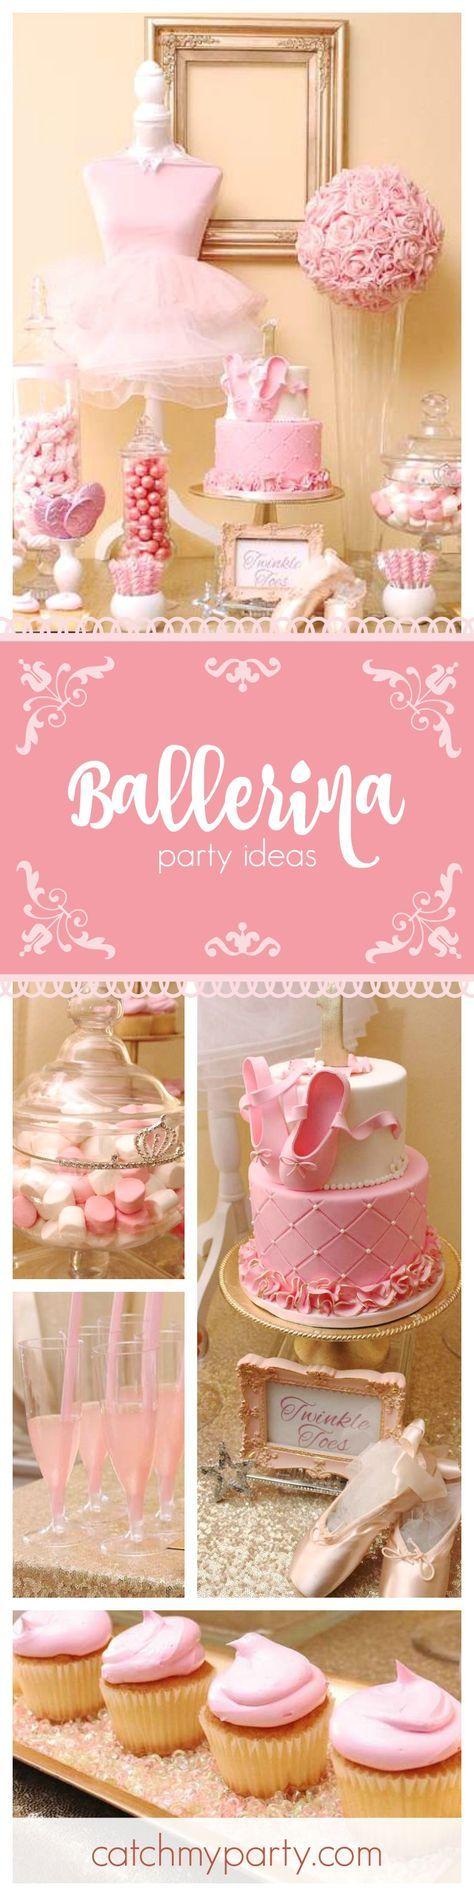 best 25 ballerina cakes ideas on pinterest ballet cakes ballet